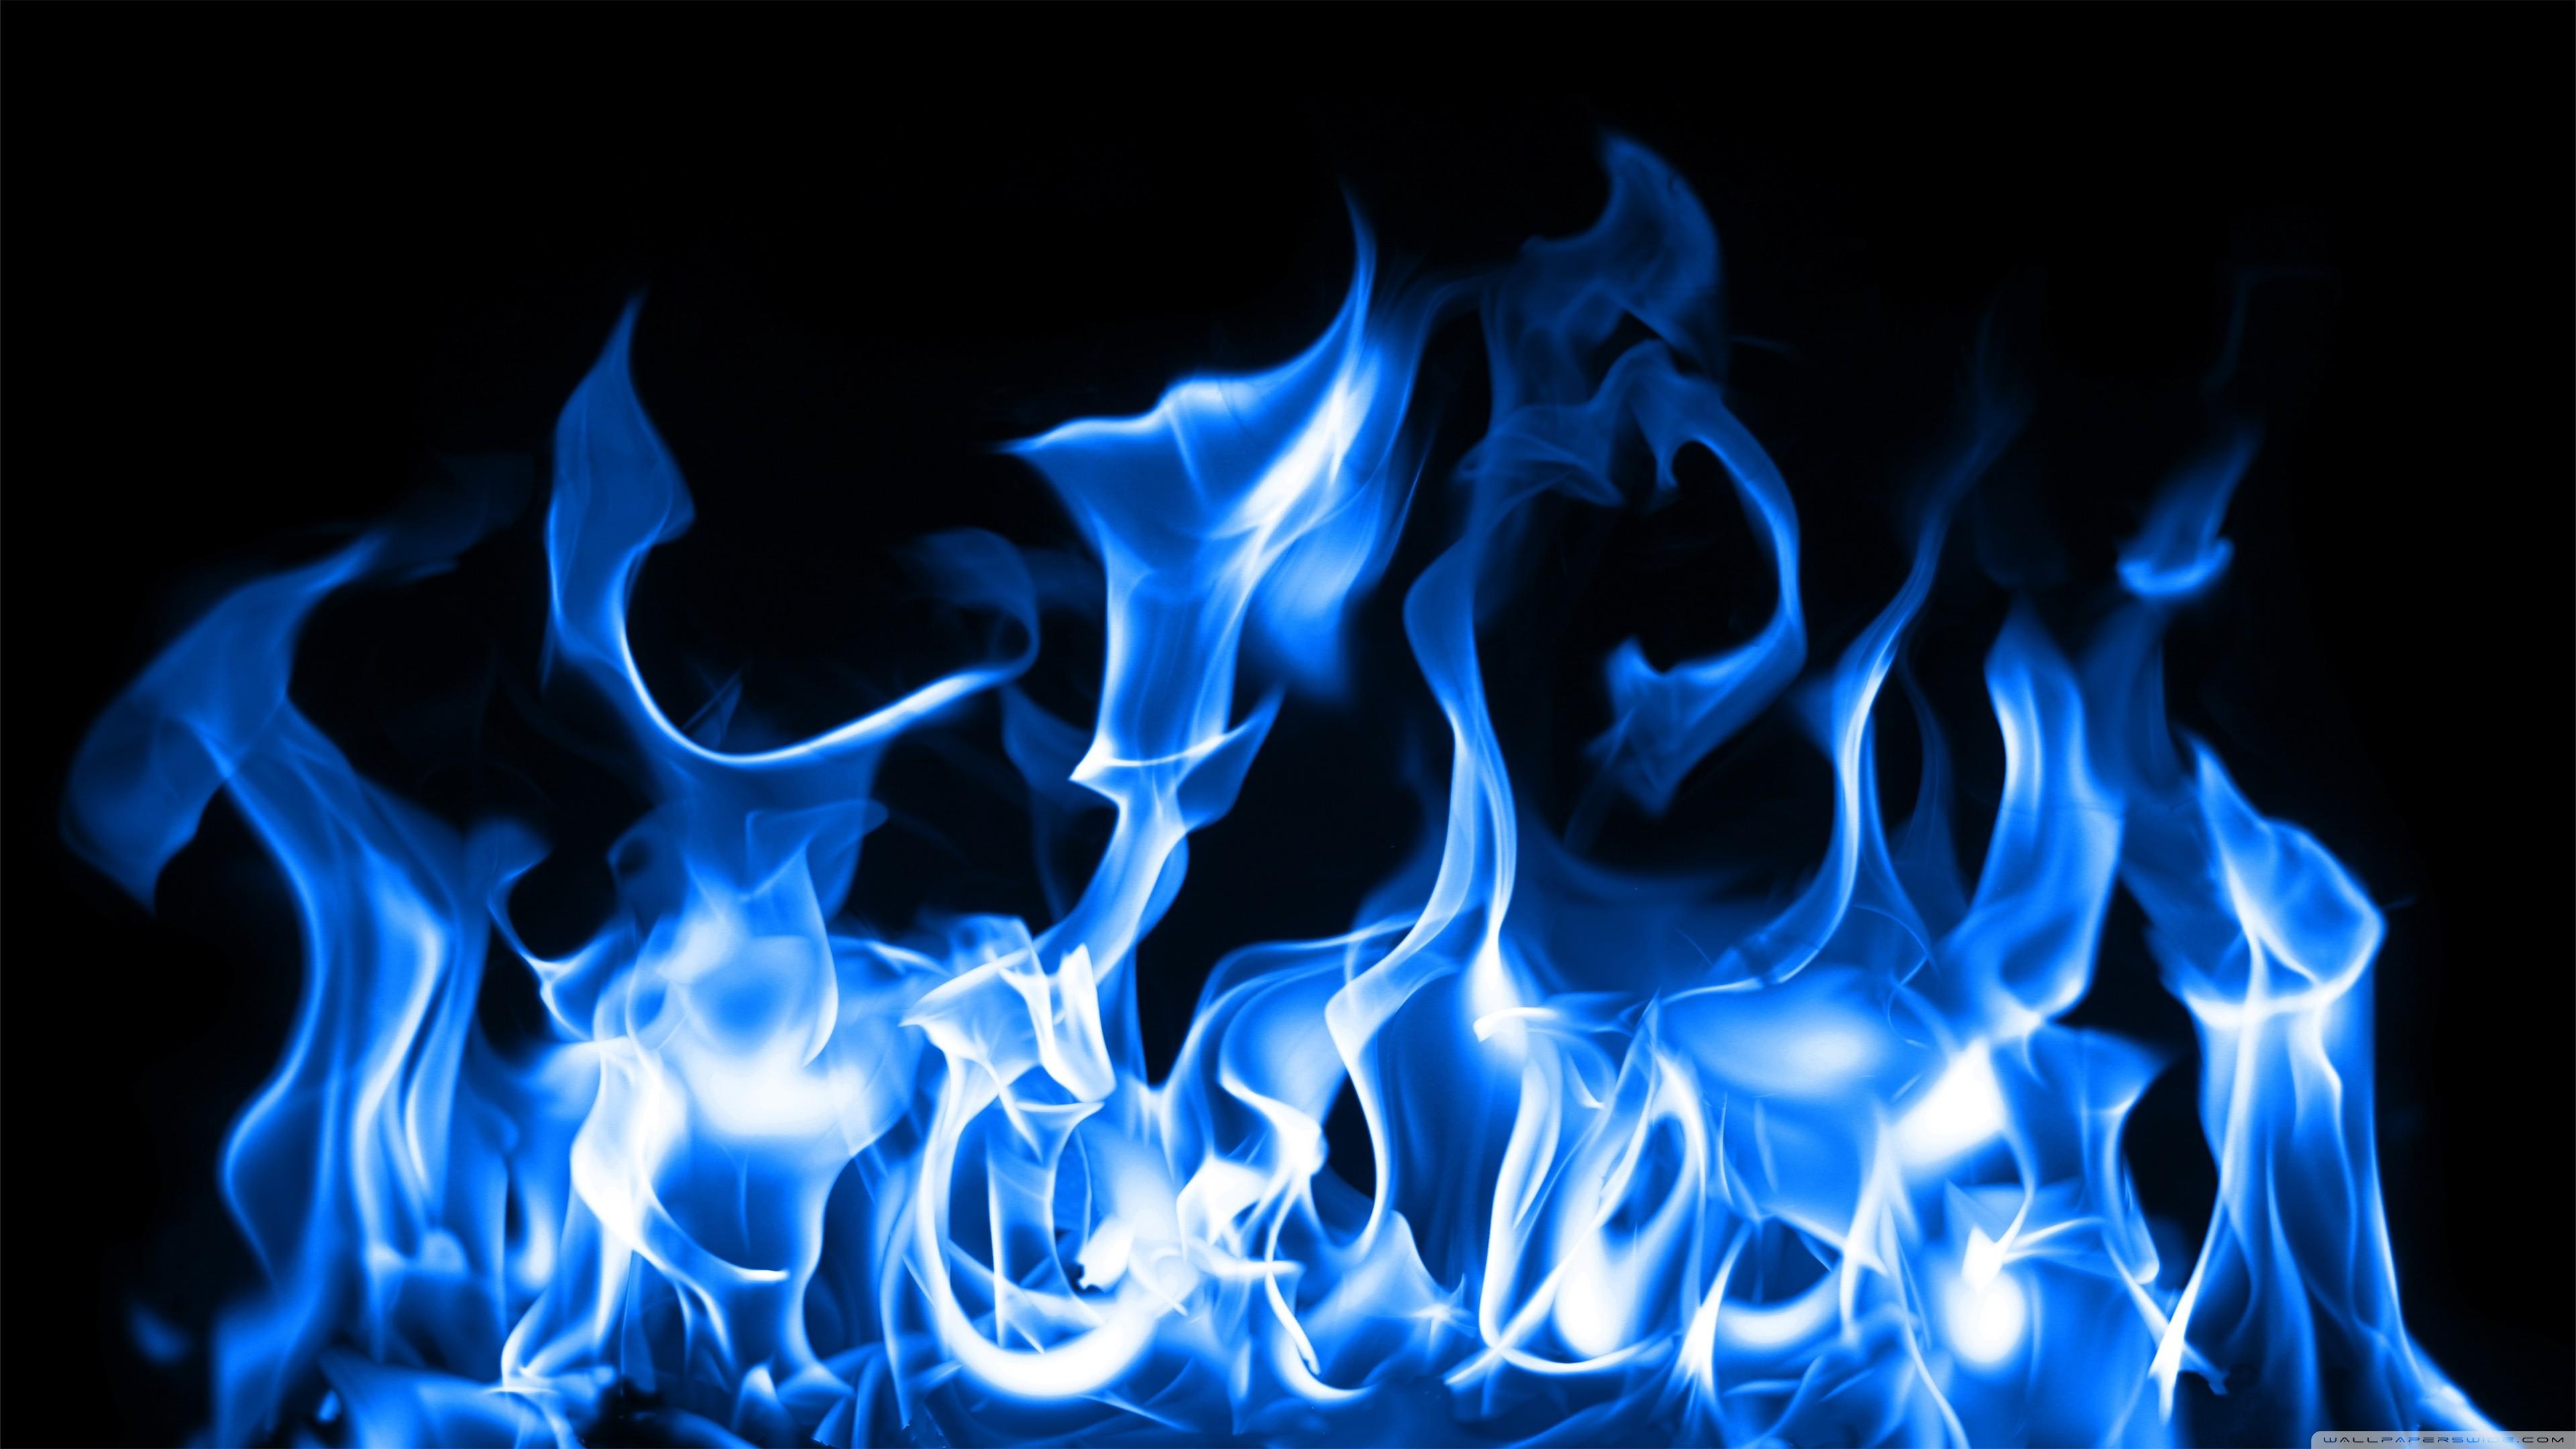 Res: 3840x2160, Download desktop blue fire wallpaper HD.